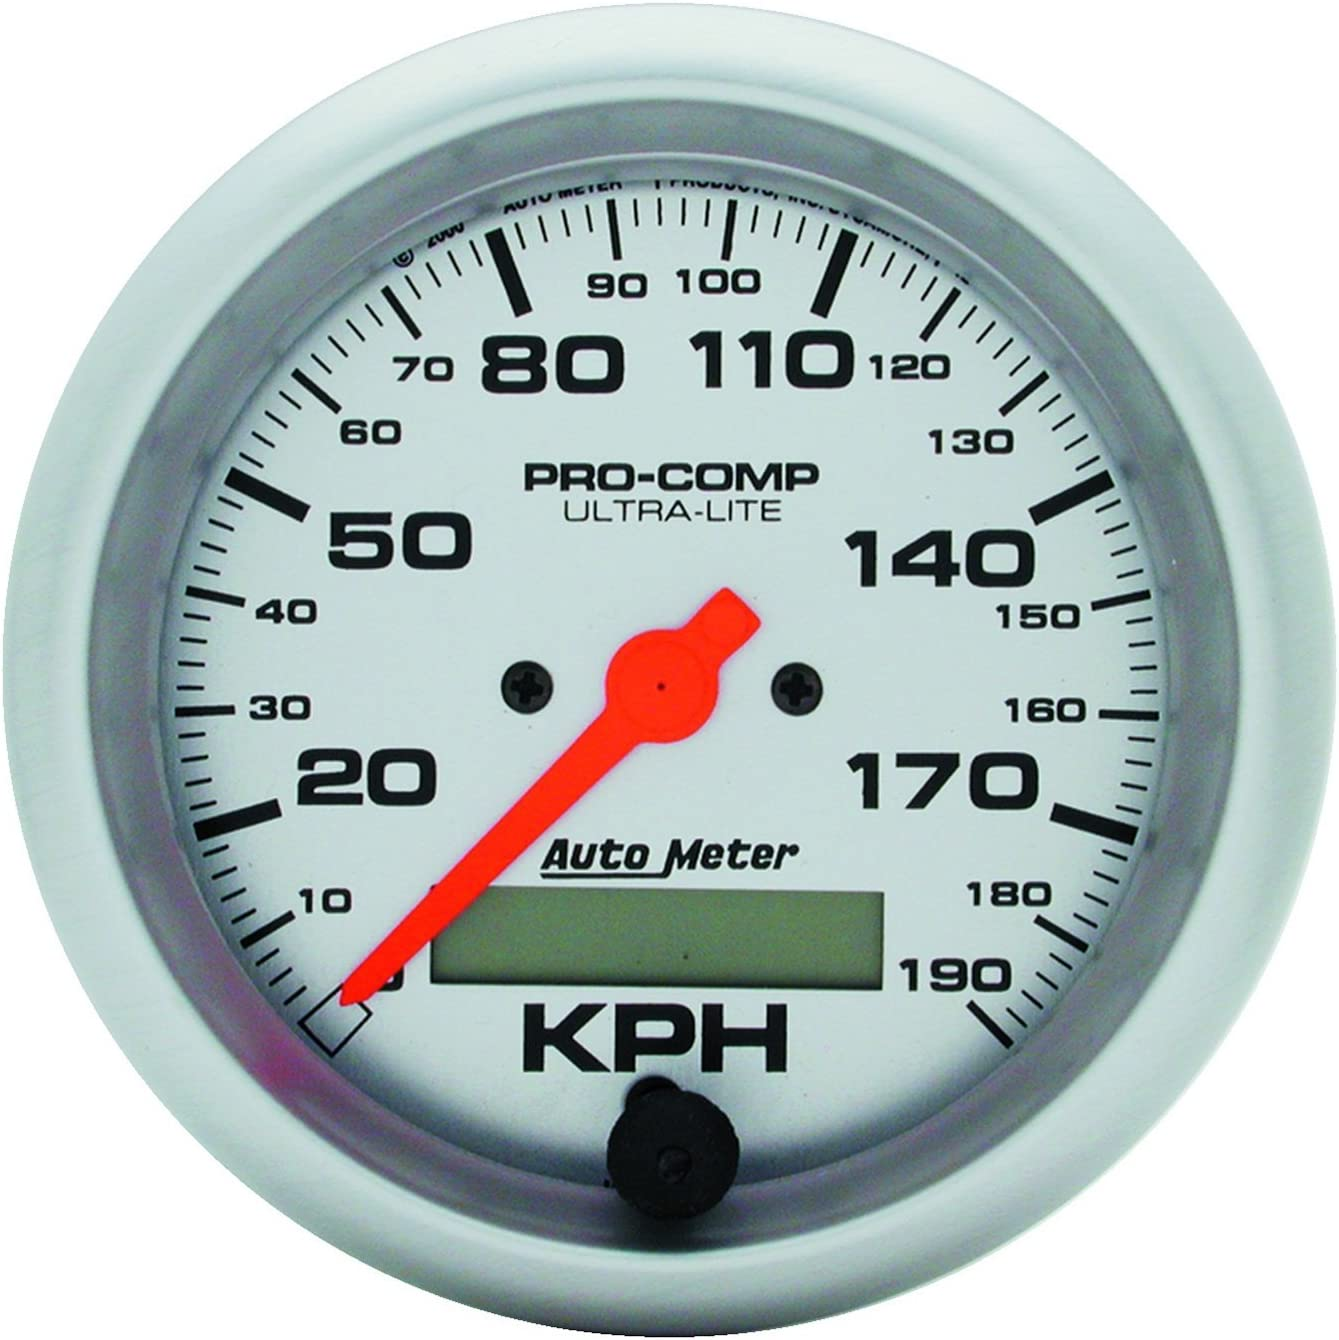 Auto Meter 4486 Ultra-Lite In-Dash Electric Speedometer